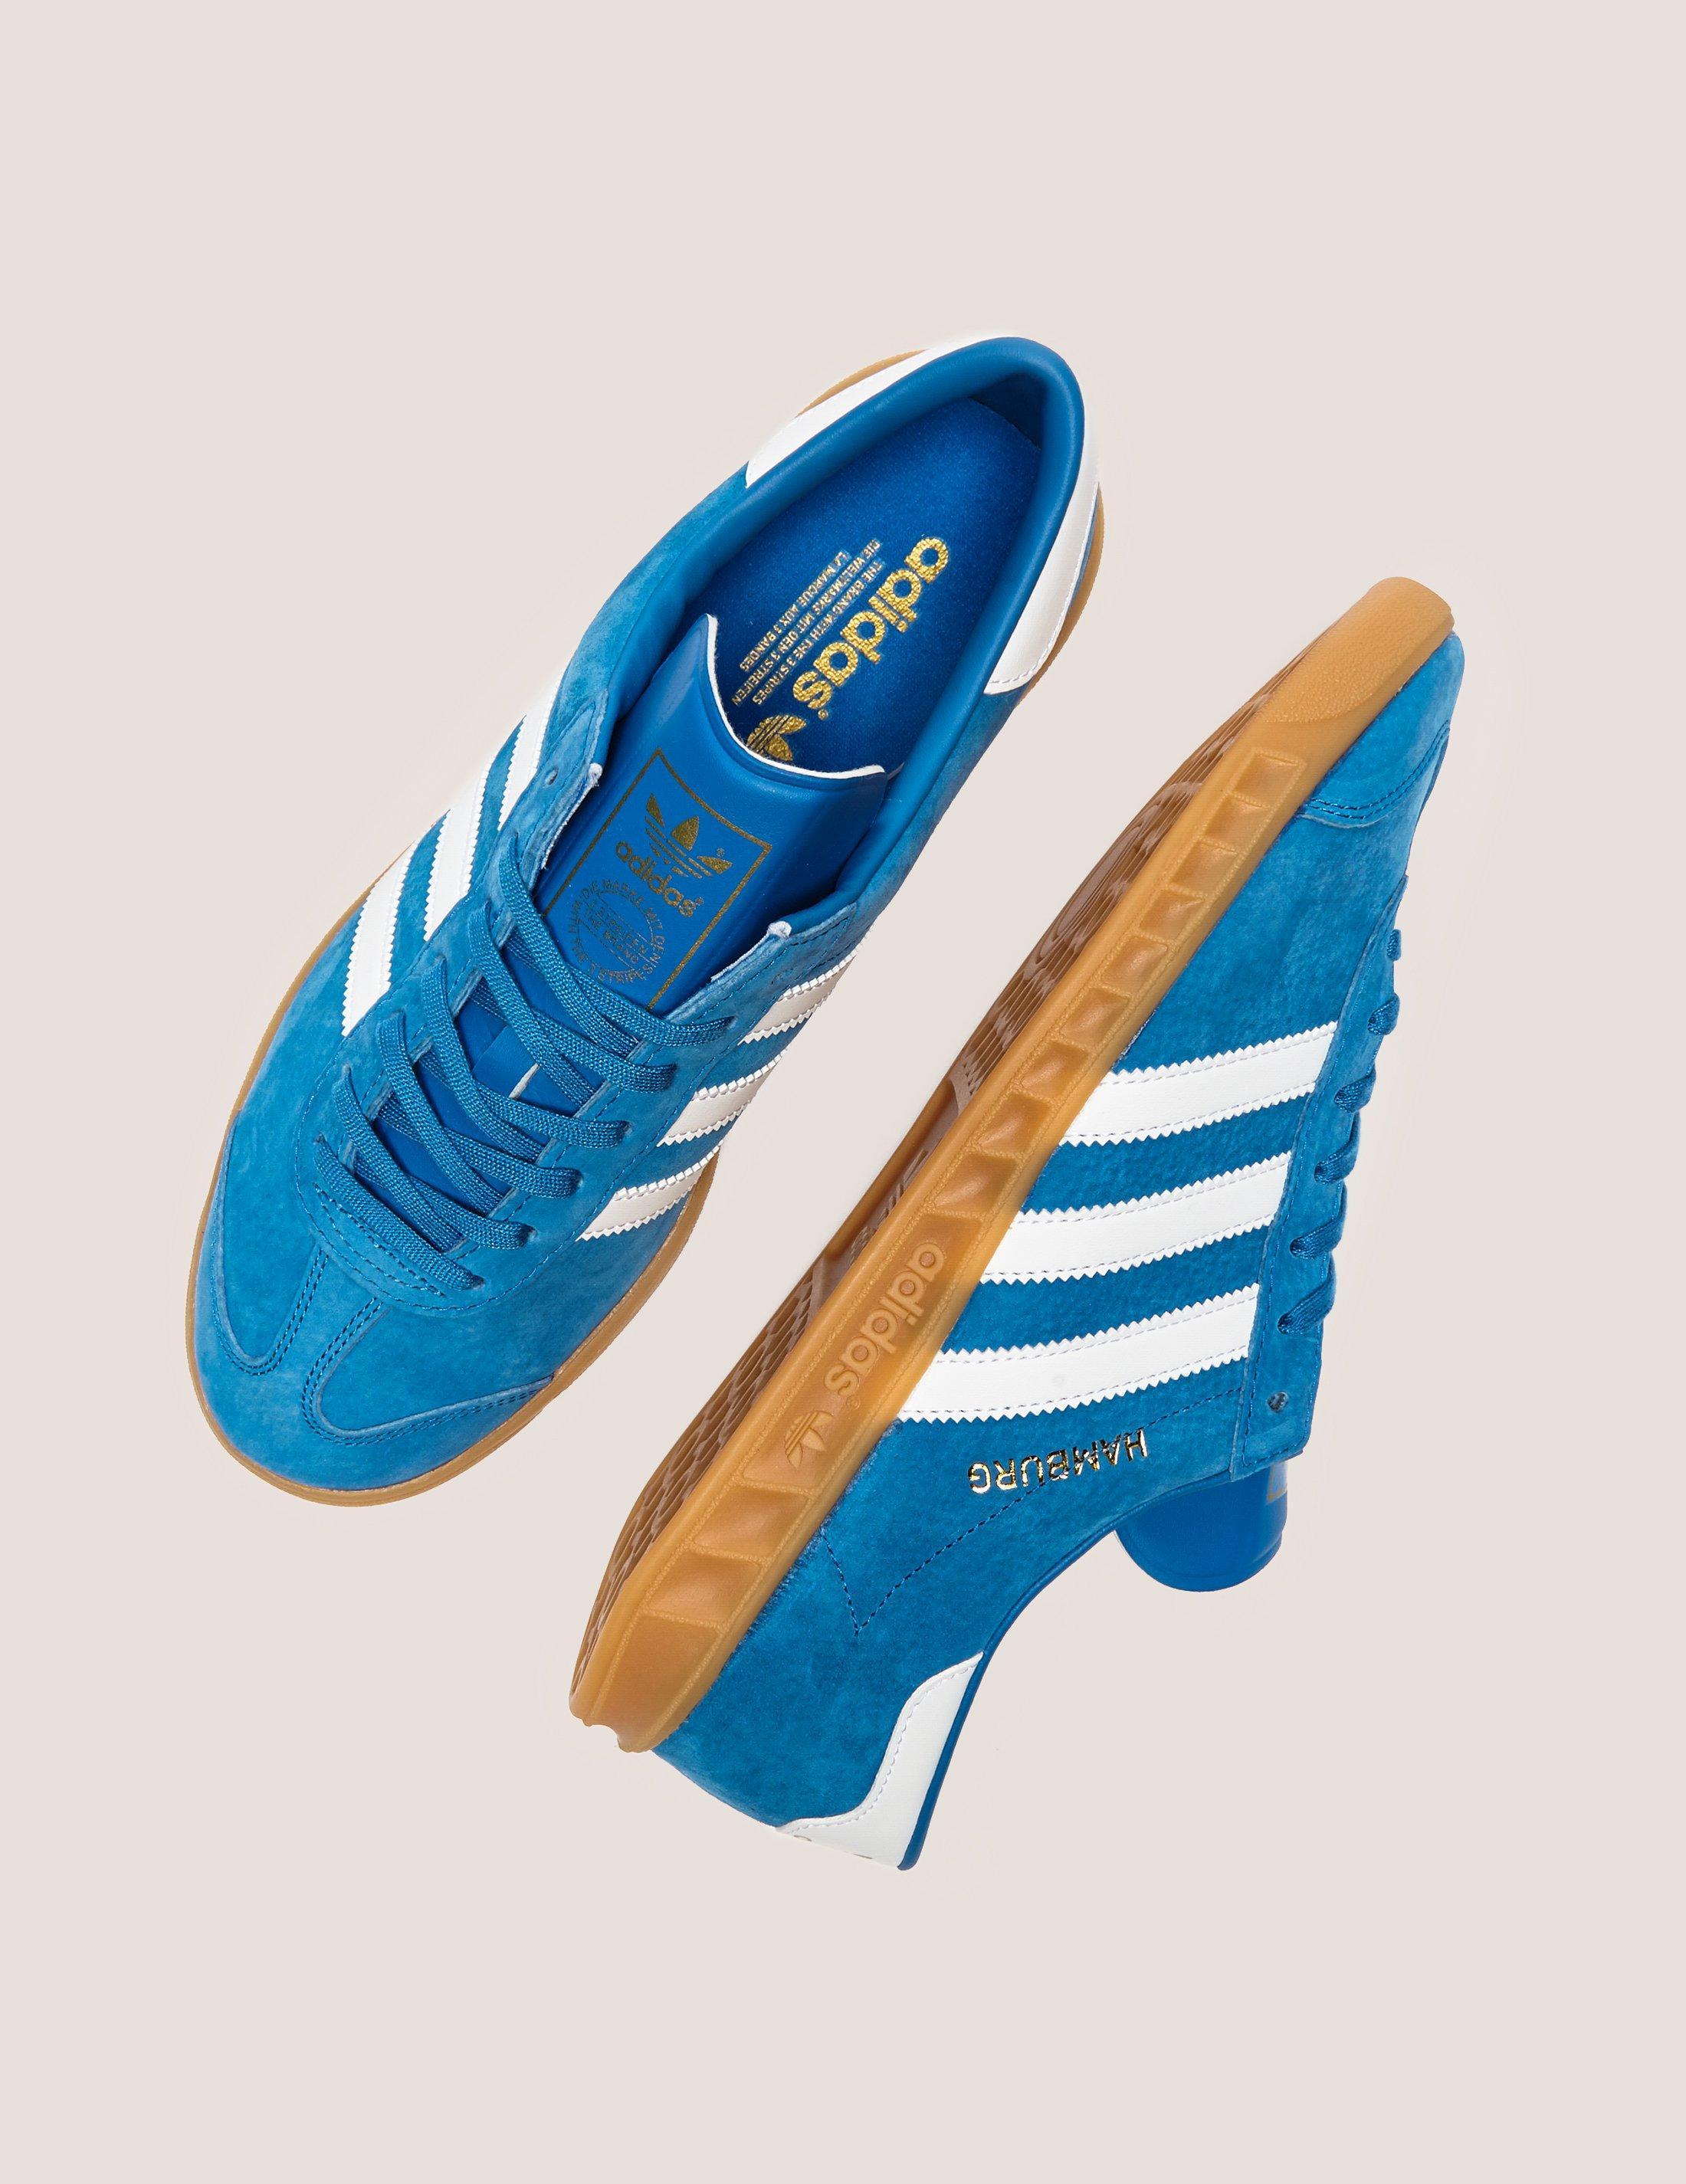 6ac067db7 Adidas Originals Mens Hamburg Bluebird white gum